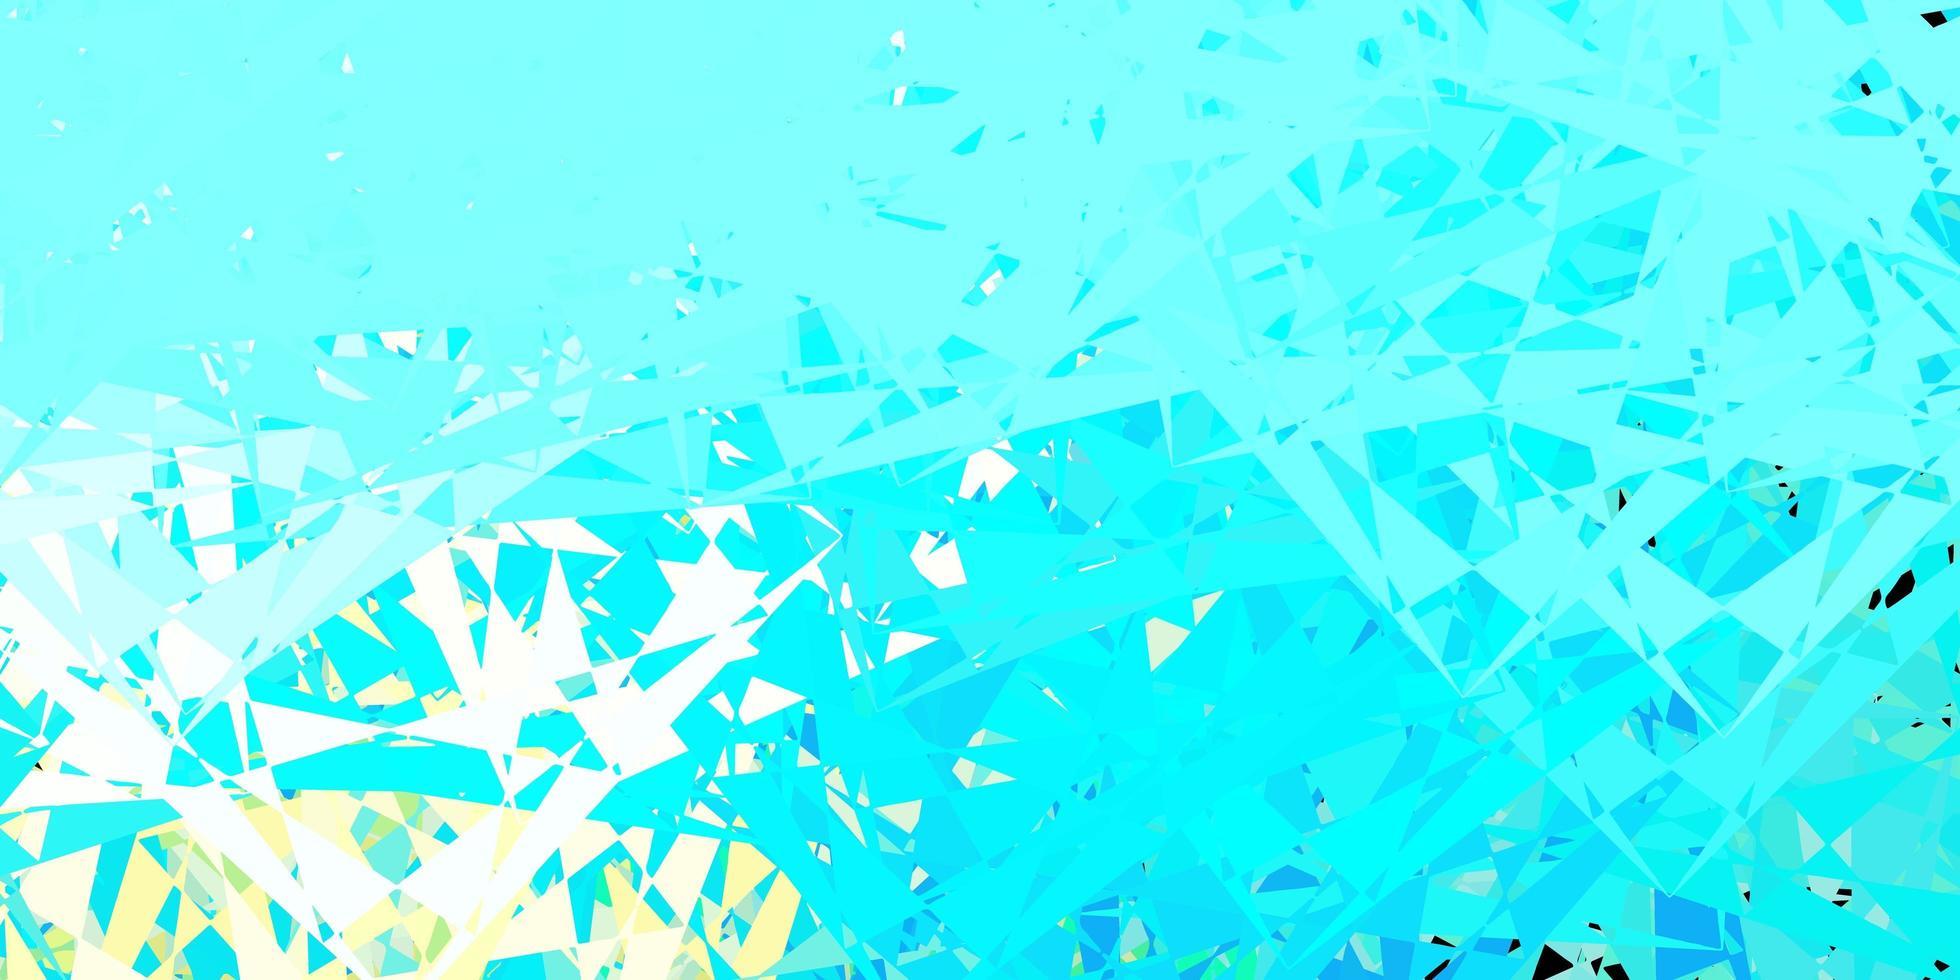 de fundo vector azul e amarelo claro com formas poligonais.